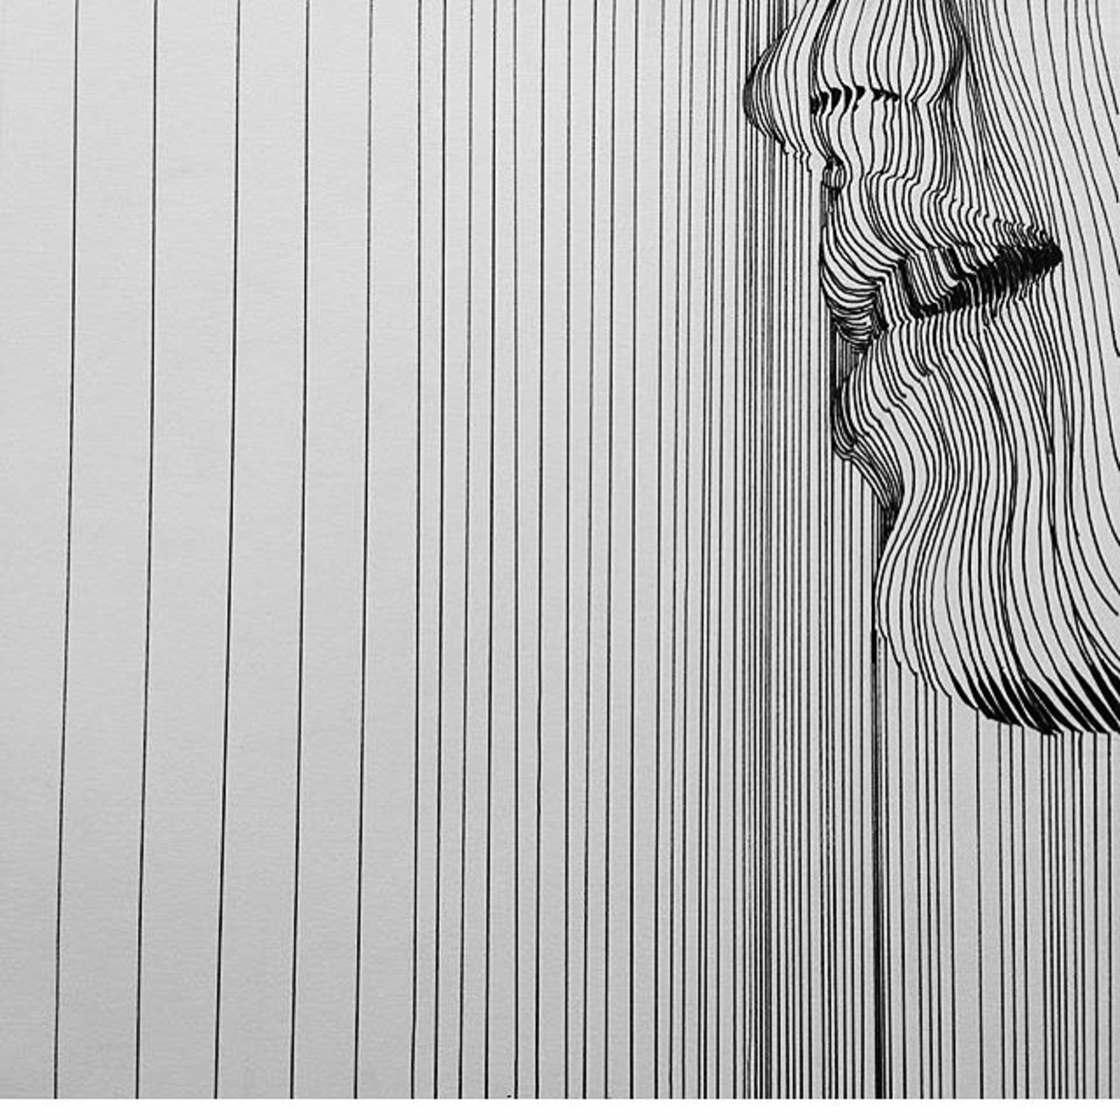 Sensual Lines - Les illustrations suggestives de Nester Formentera